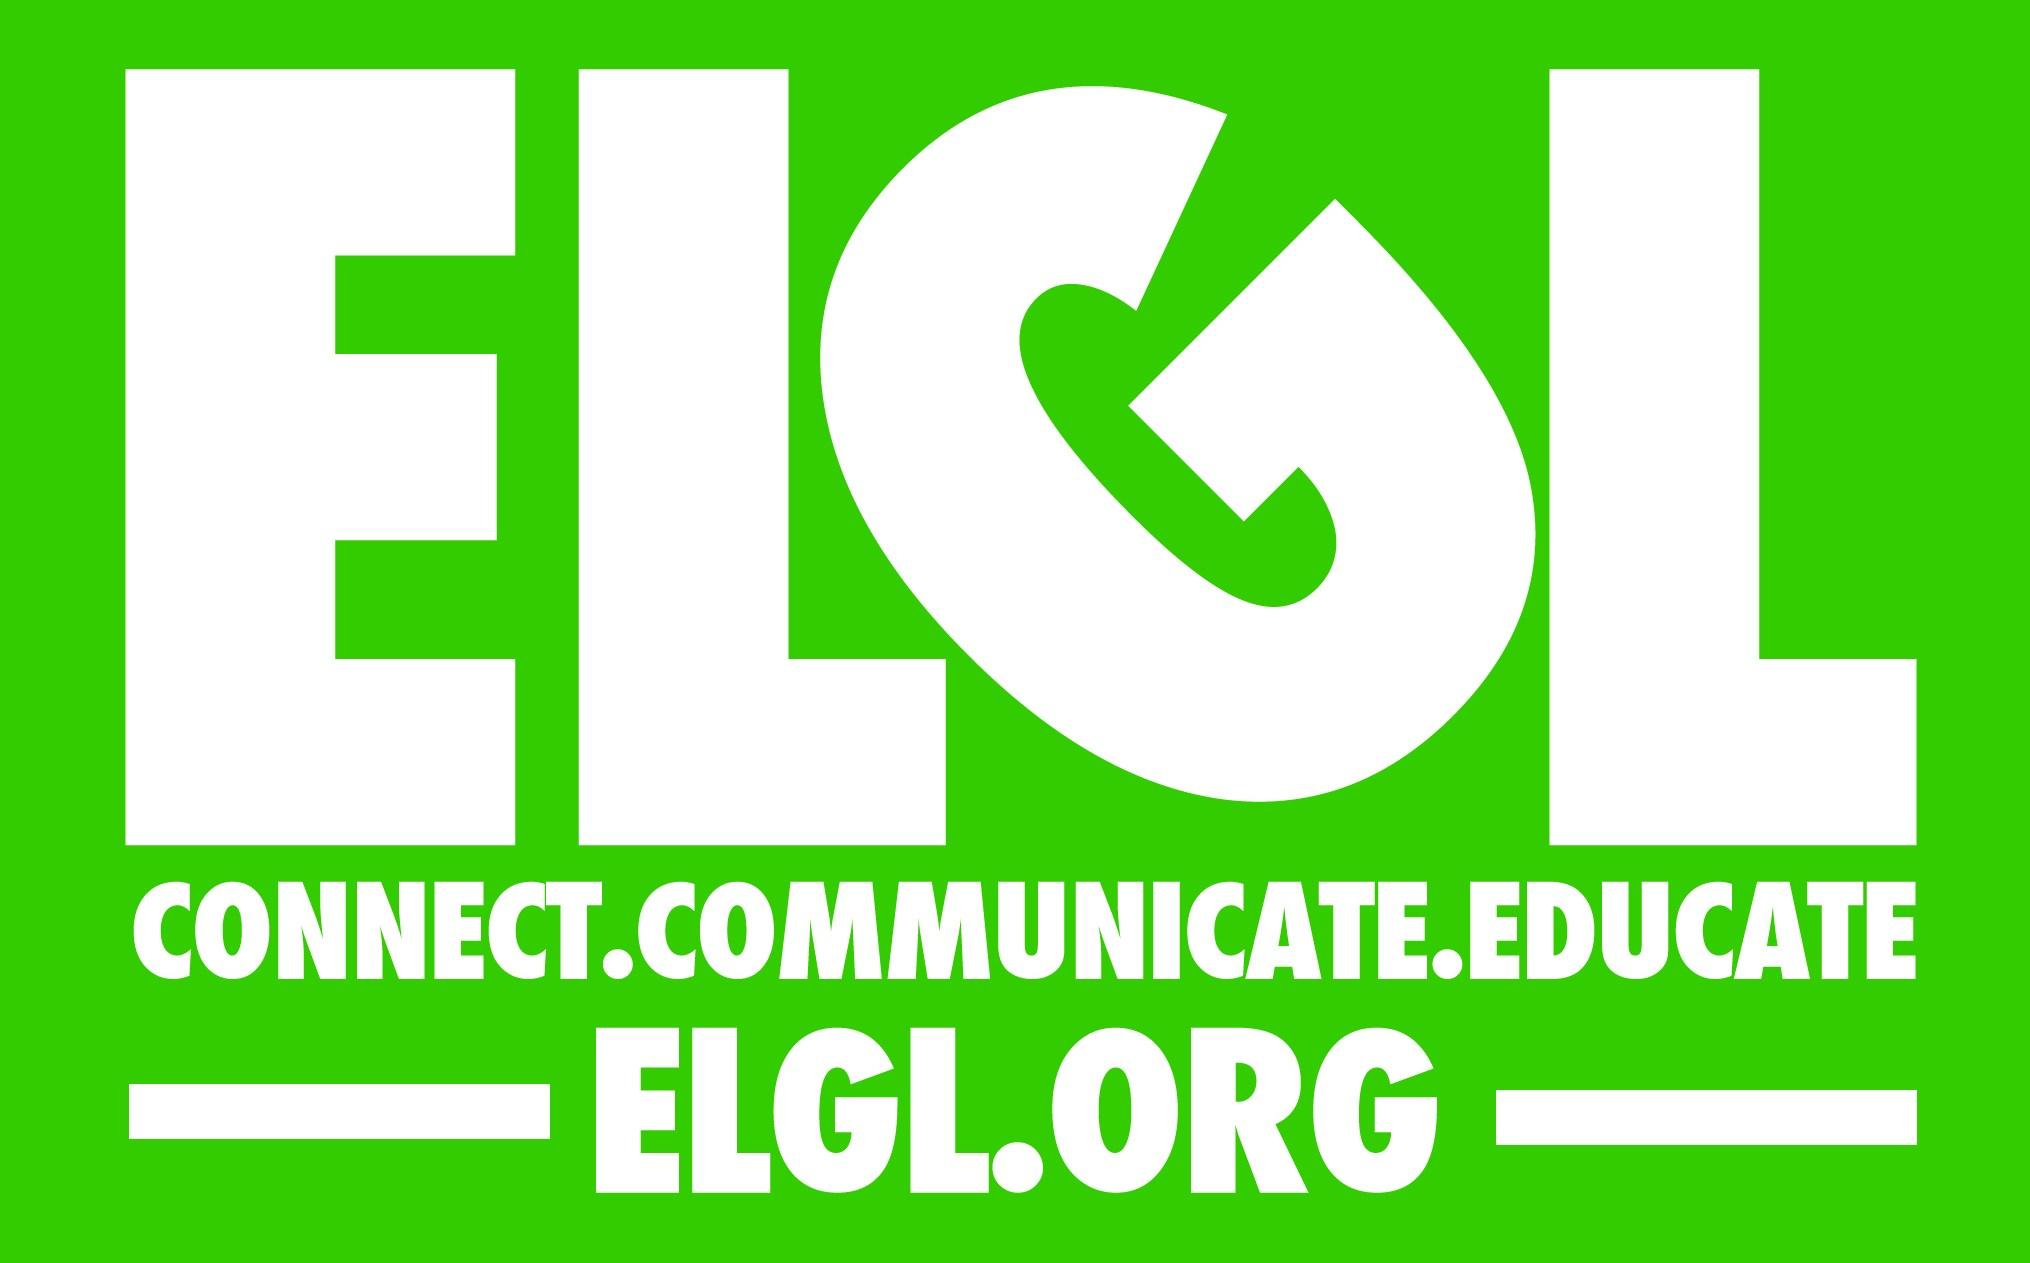 ELGL-LOGO-Update-2014-GREEN-31.jpeg